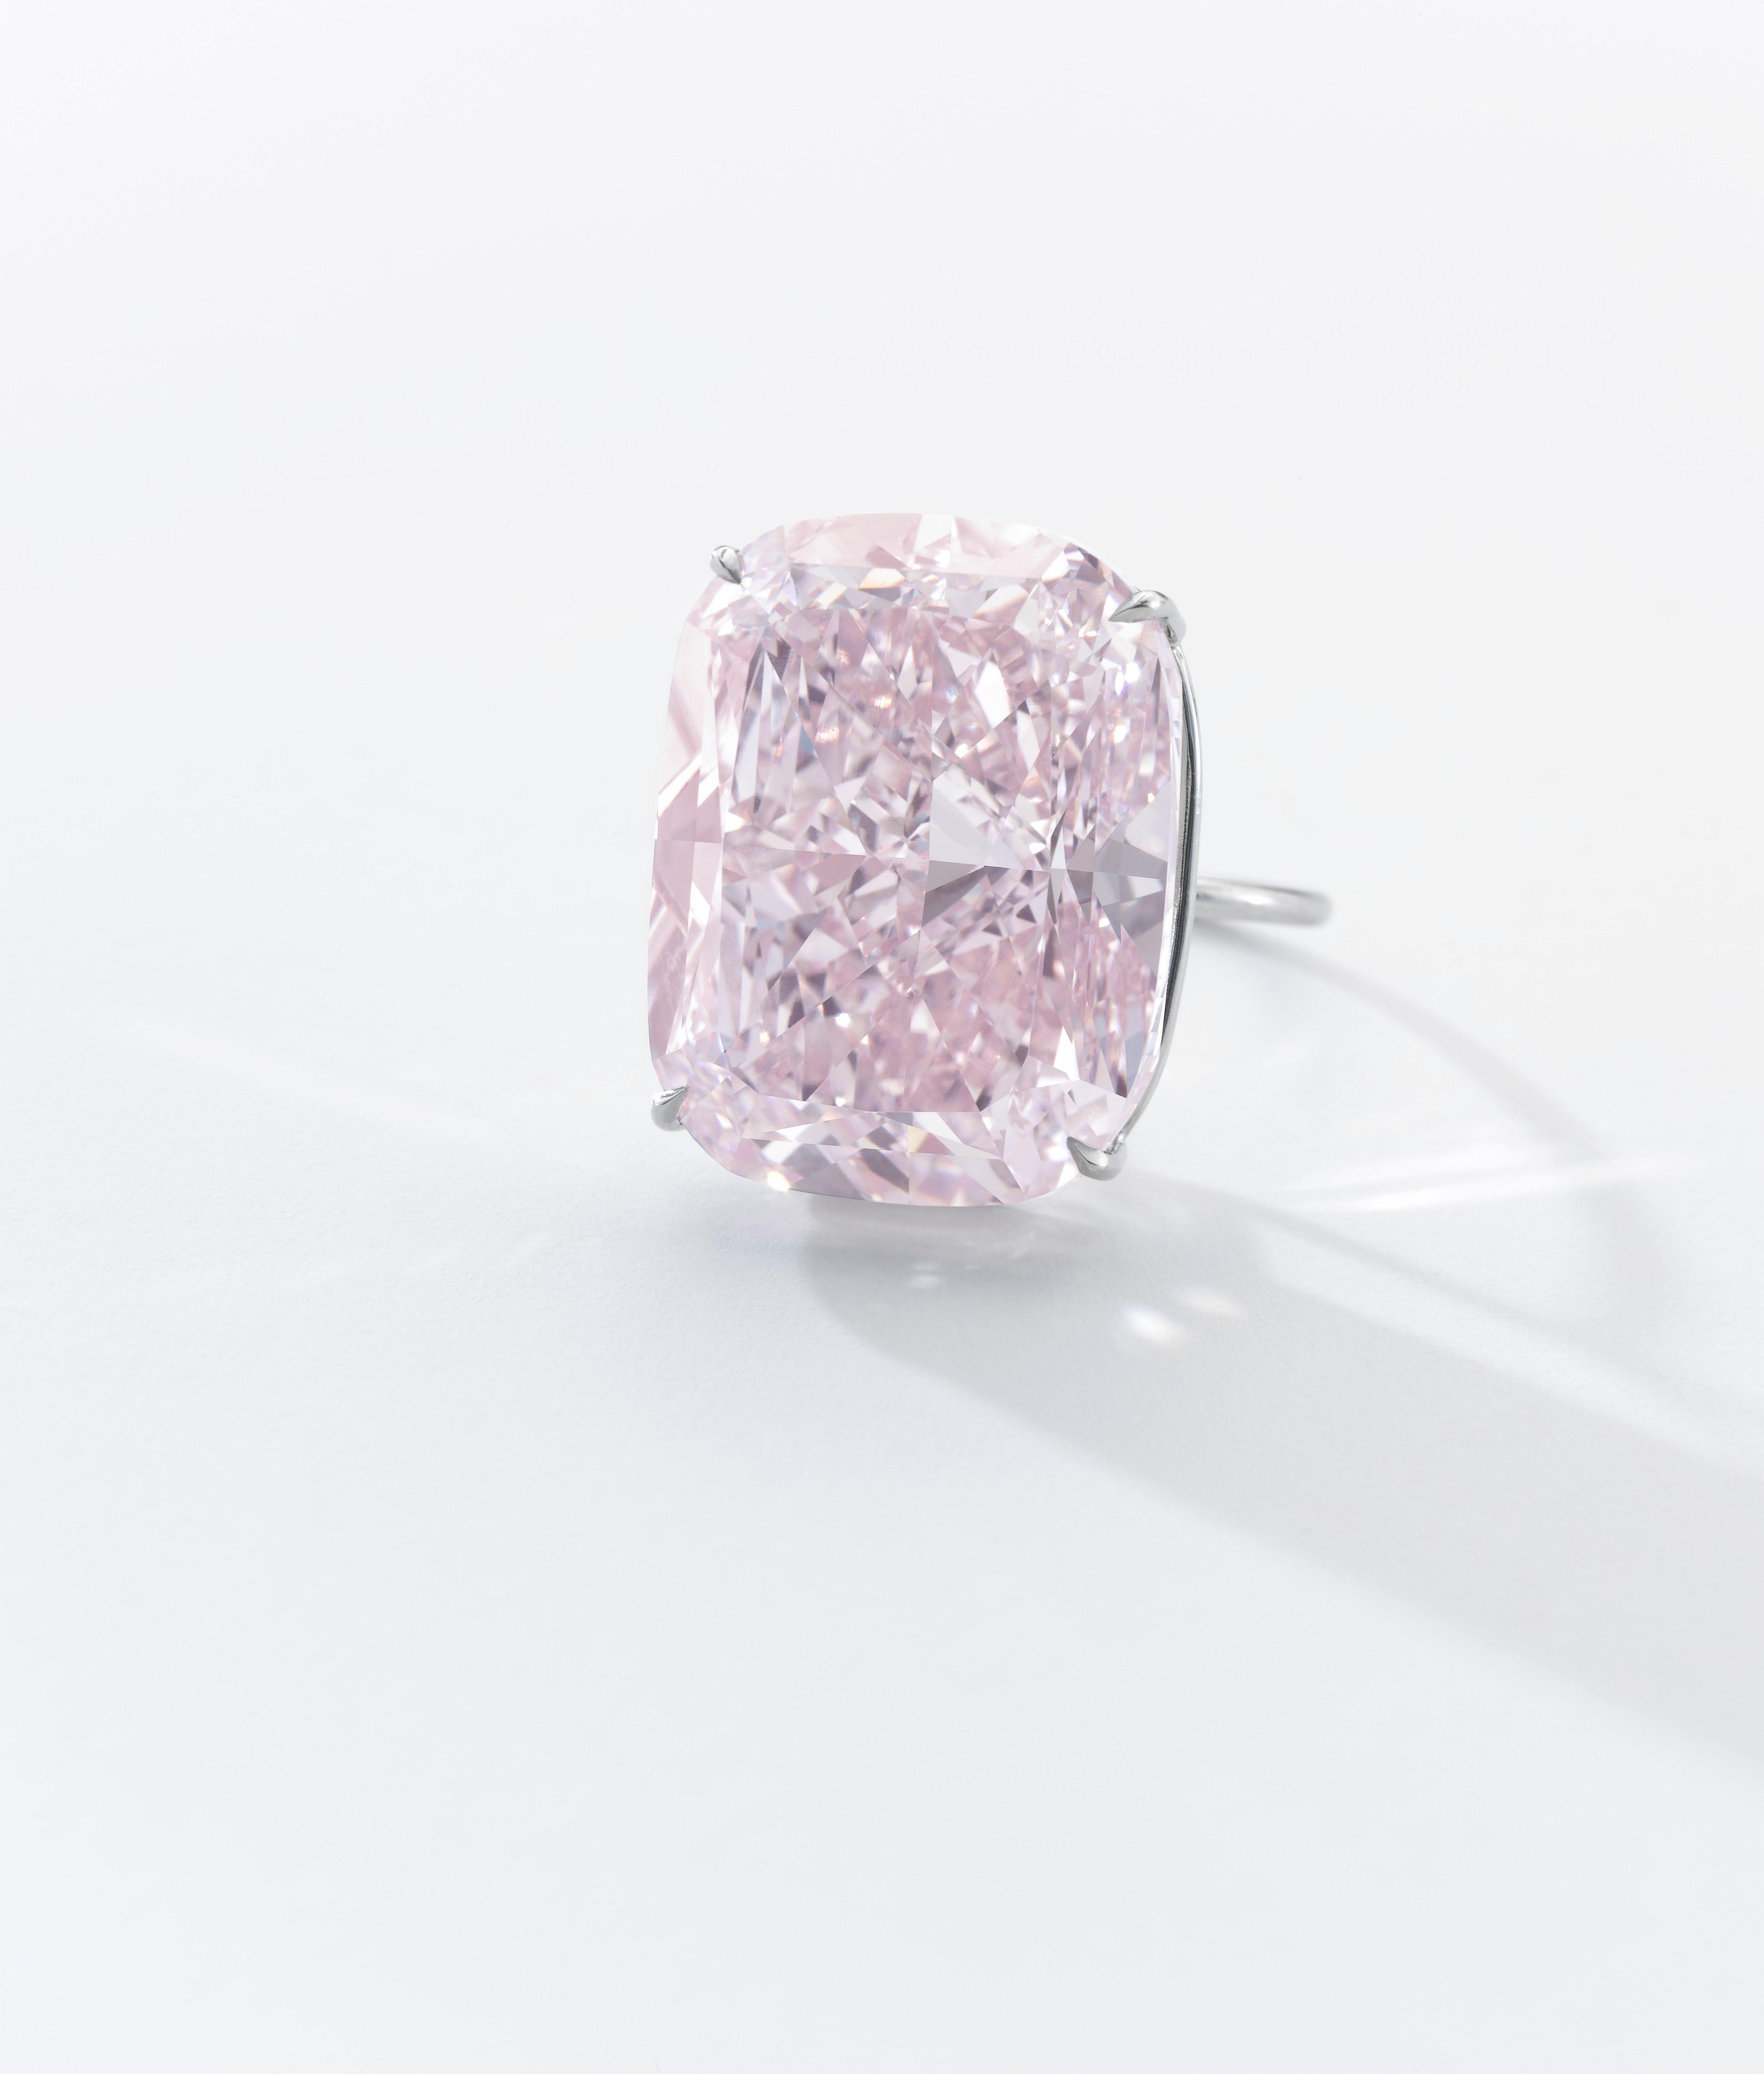 The 37.3 carat Raj Pink diamond